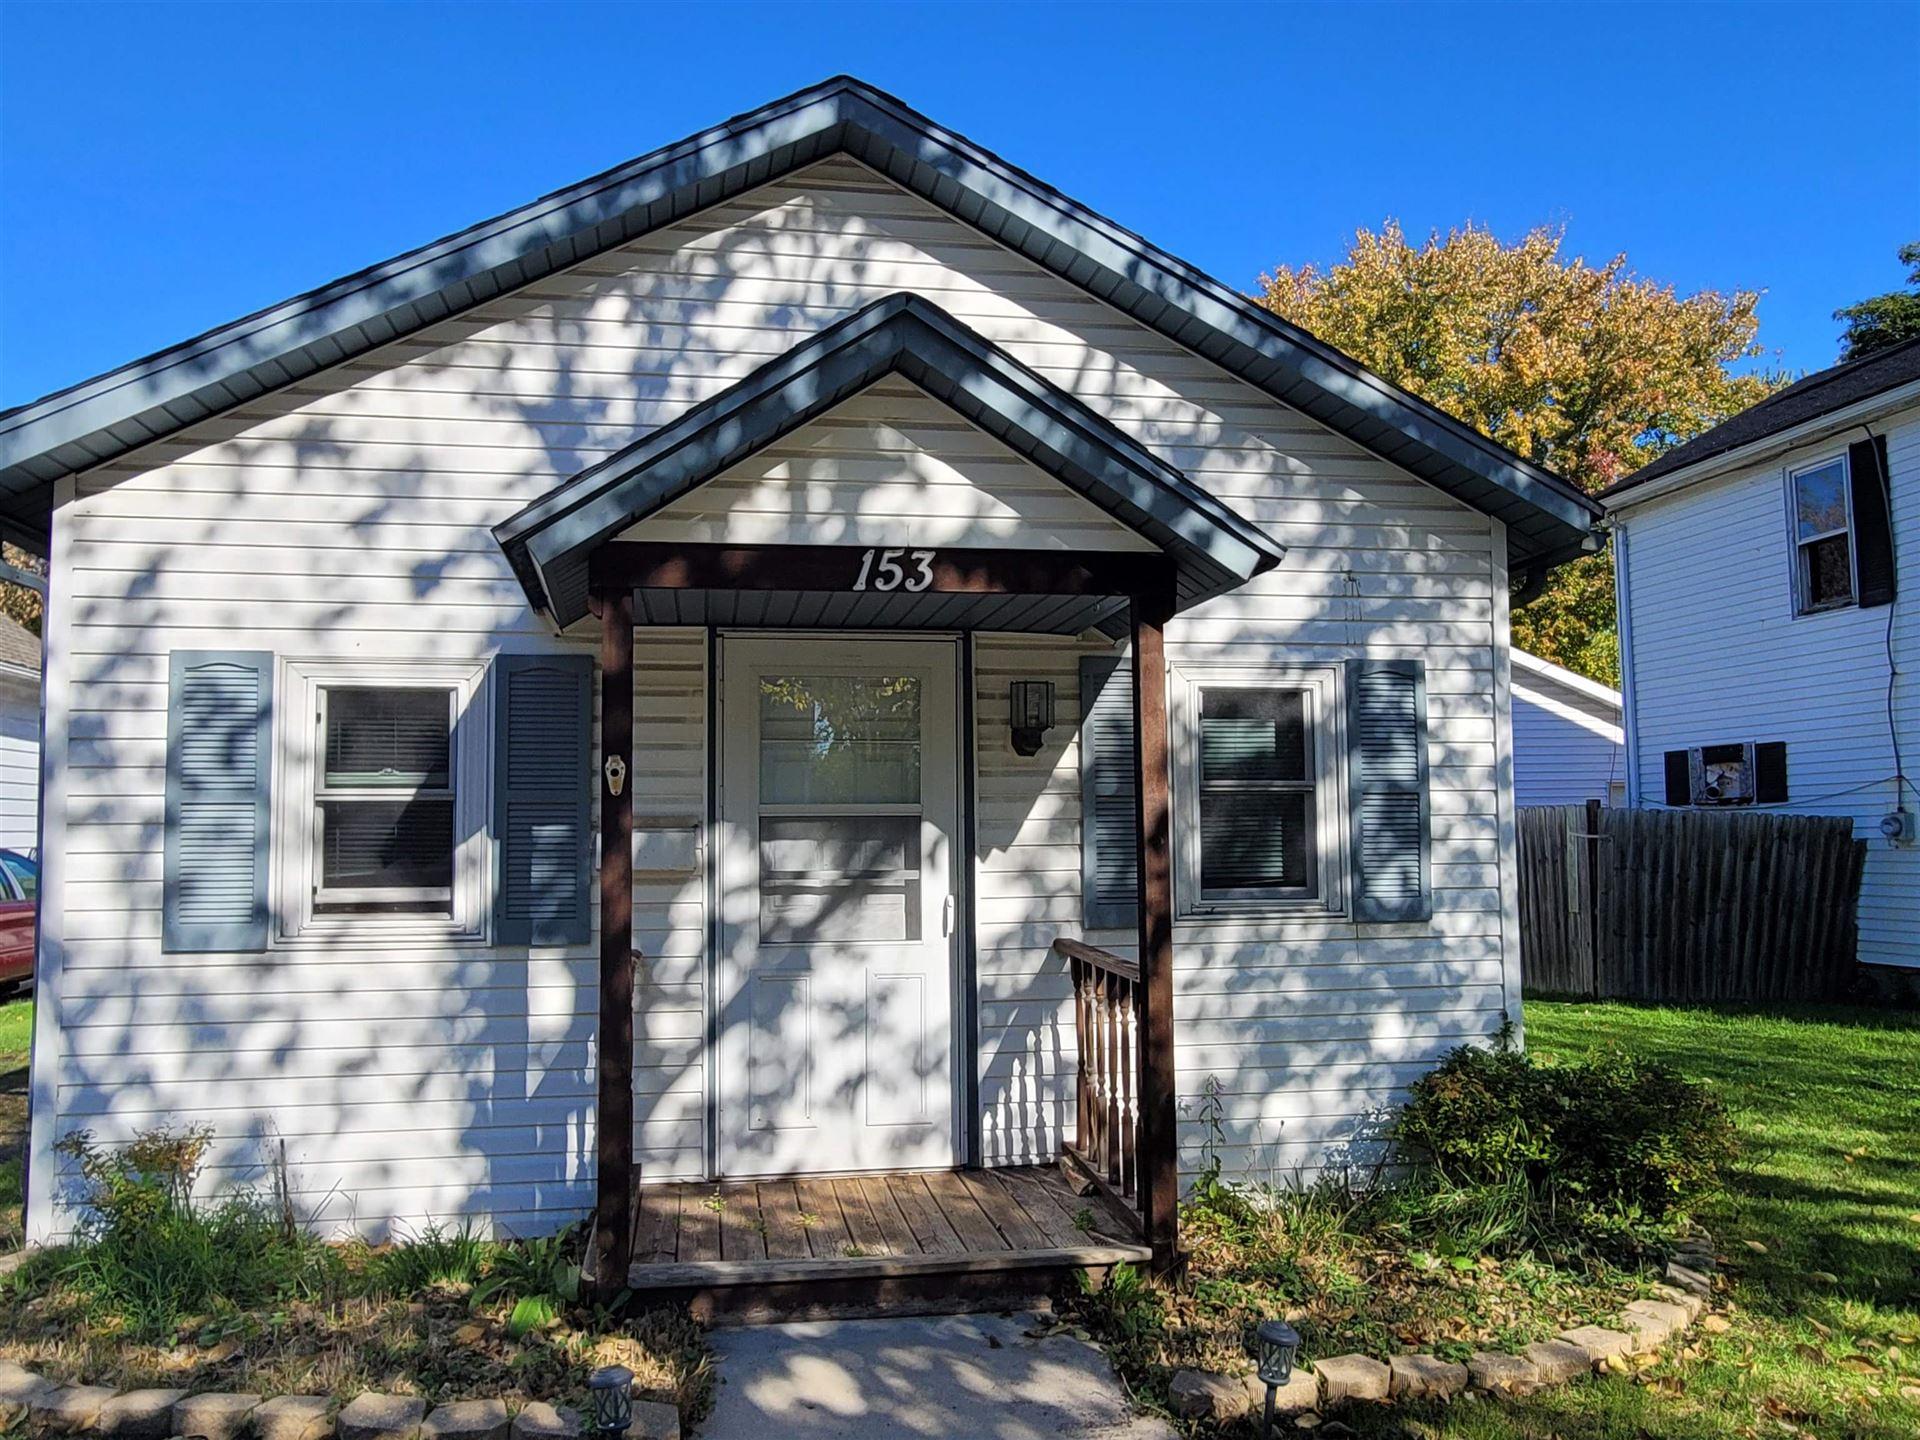 153 ROSE Avenue, Fond du Lac, WI 54935 - MLS#: 50250236